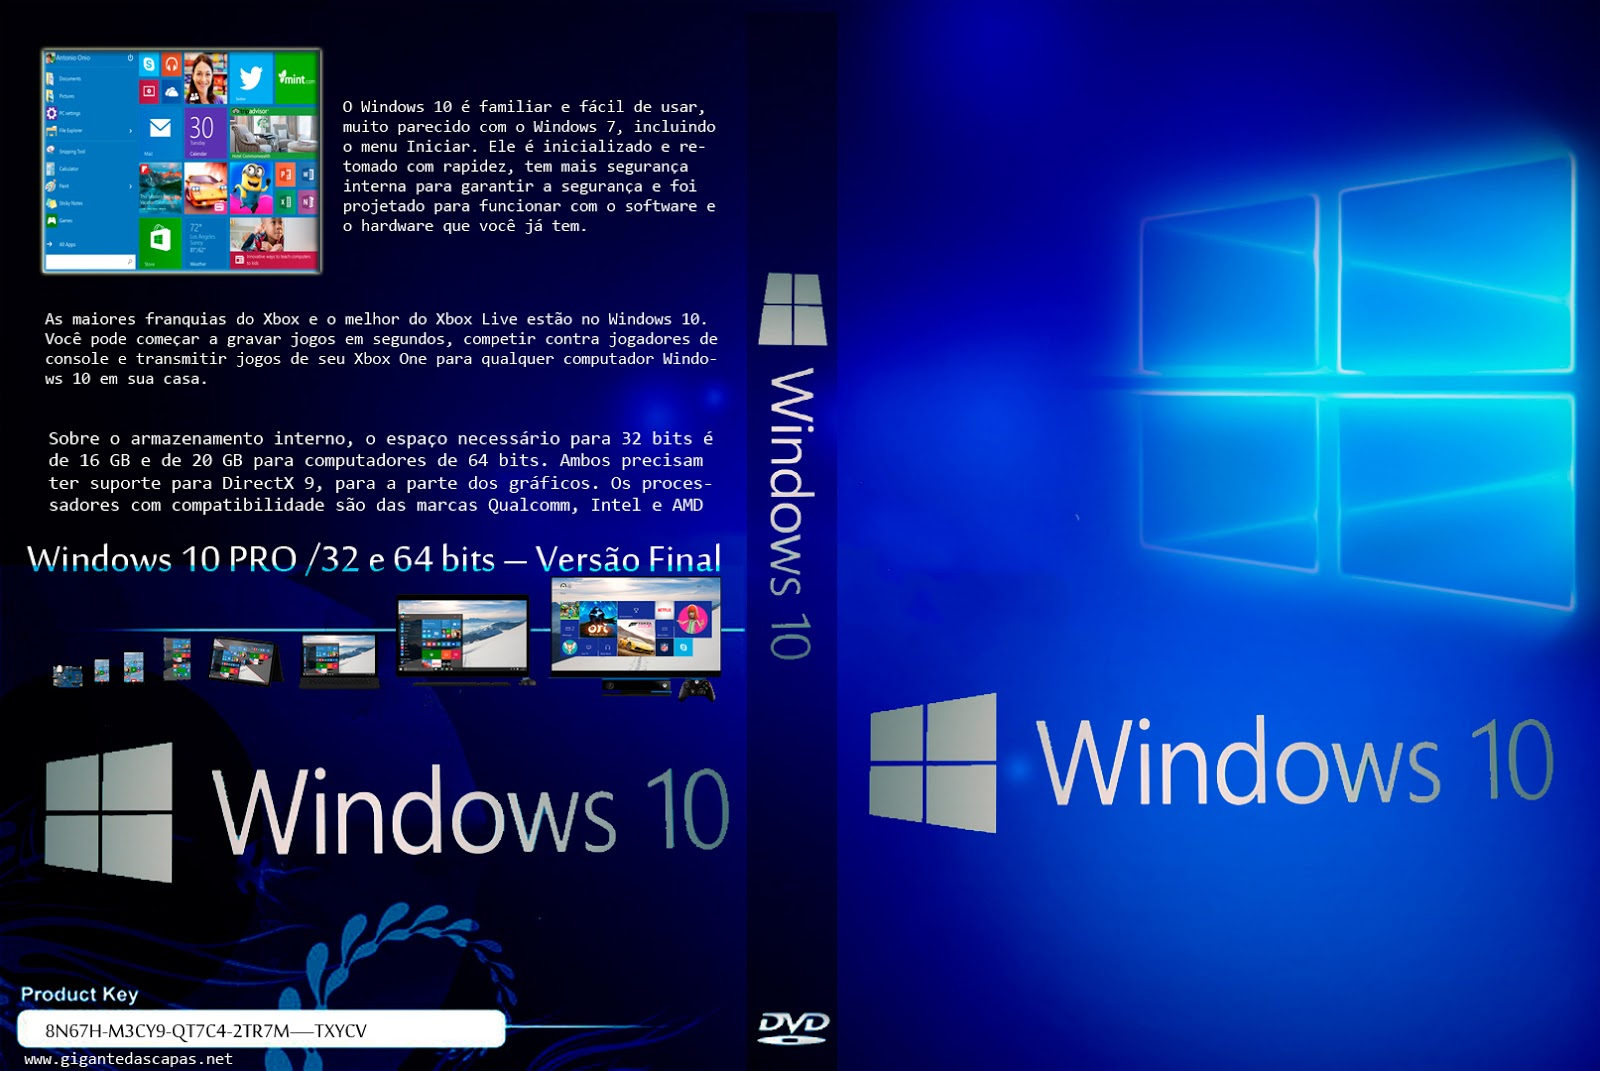 Download windows 10 pro for Windows 10 pro